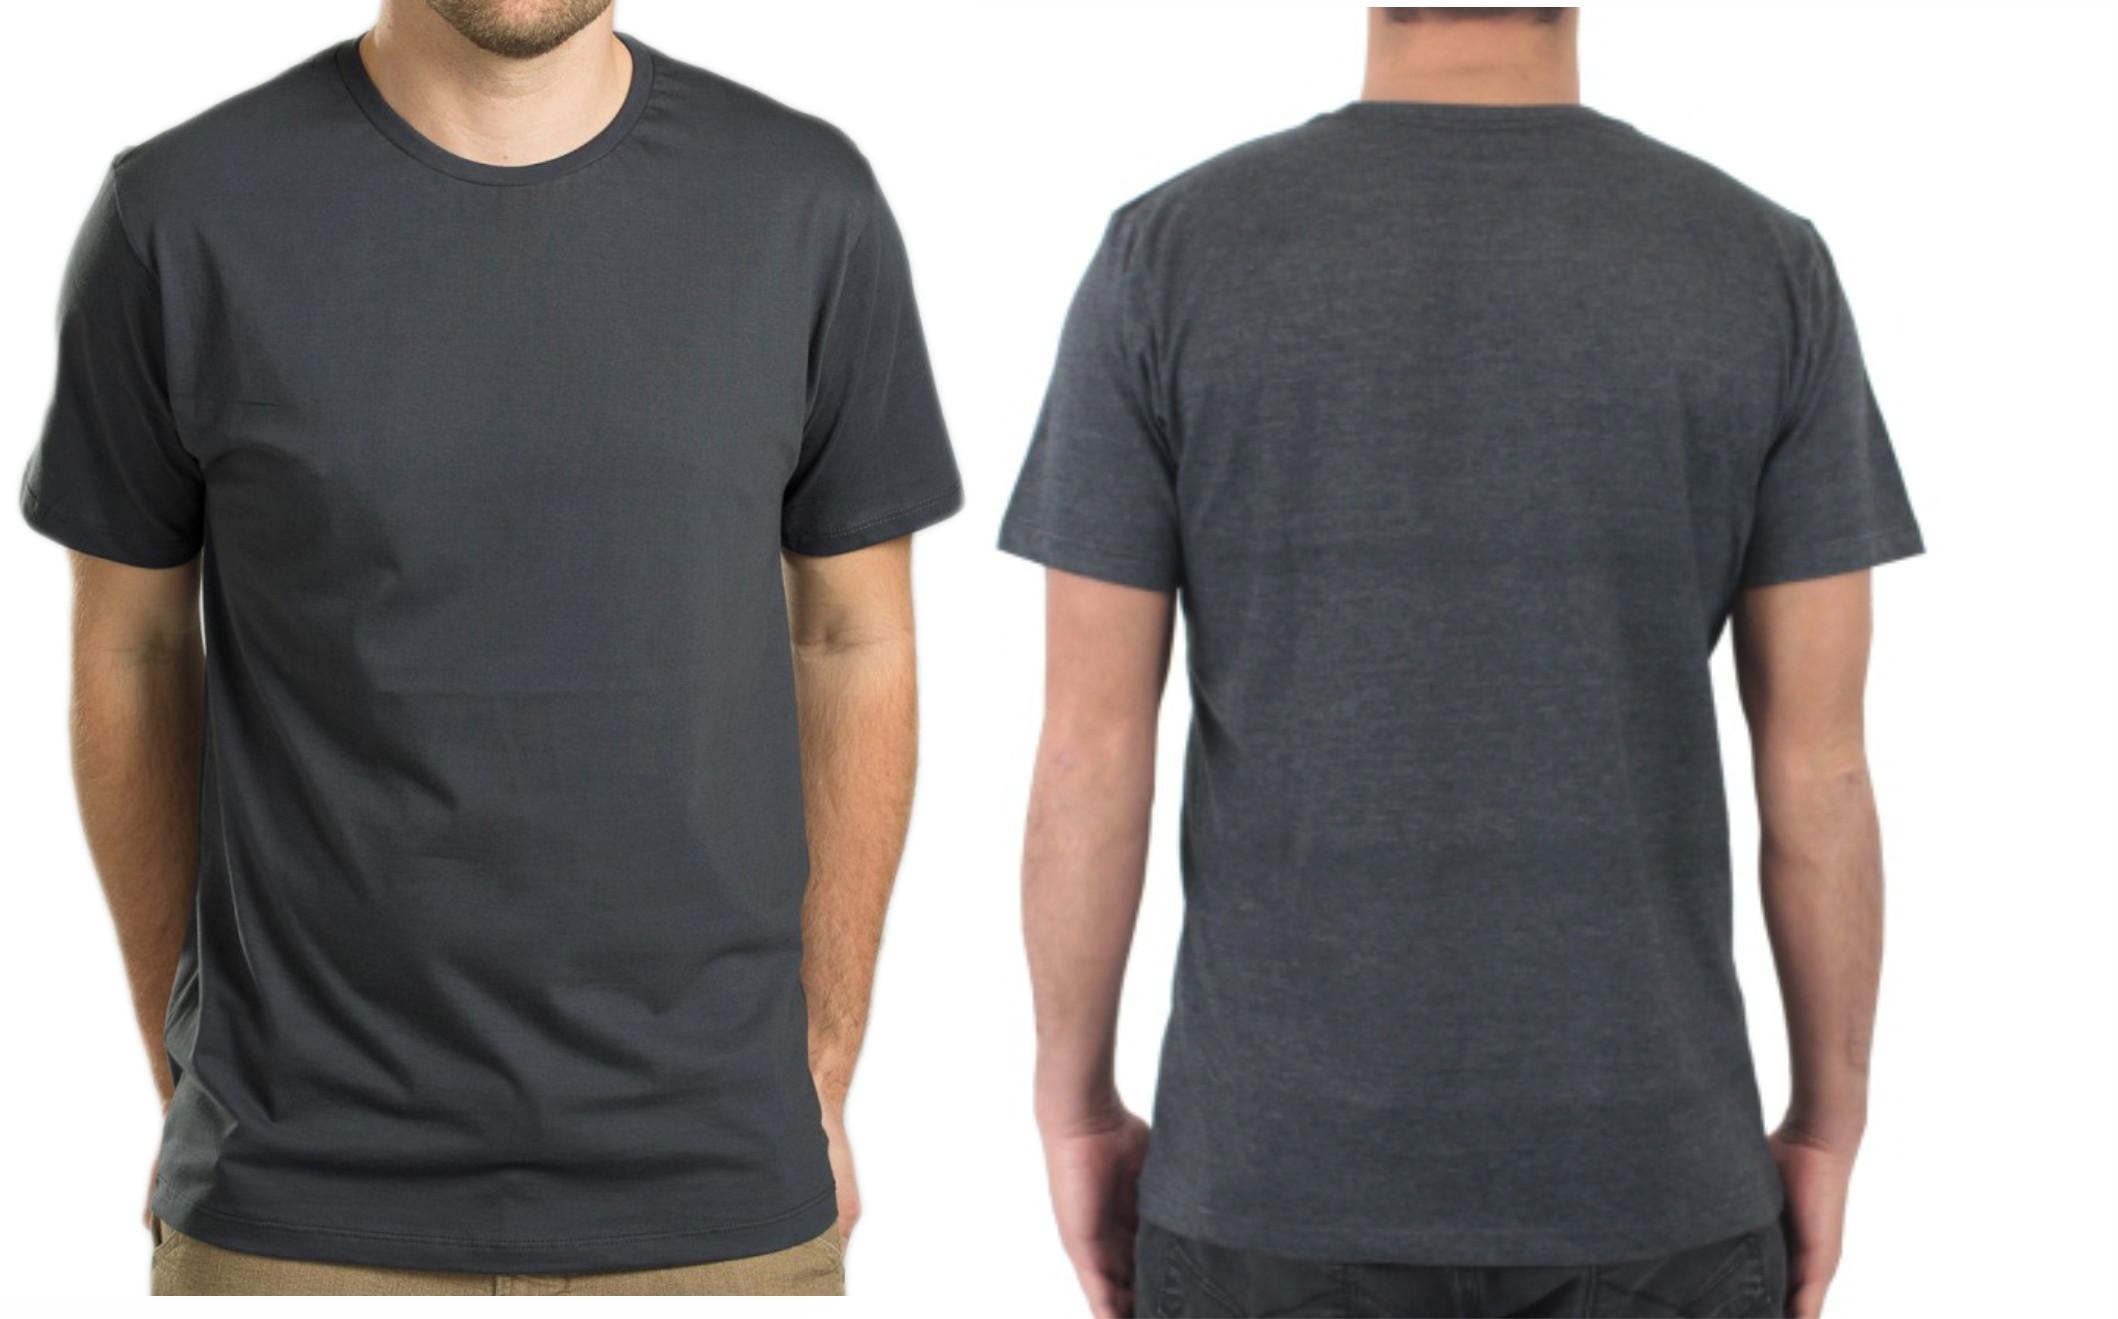 c41b673a816a2 Camiseta Infantil Lisa Atacado